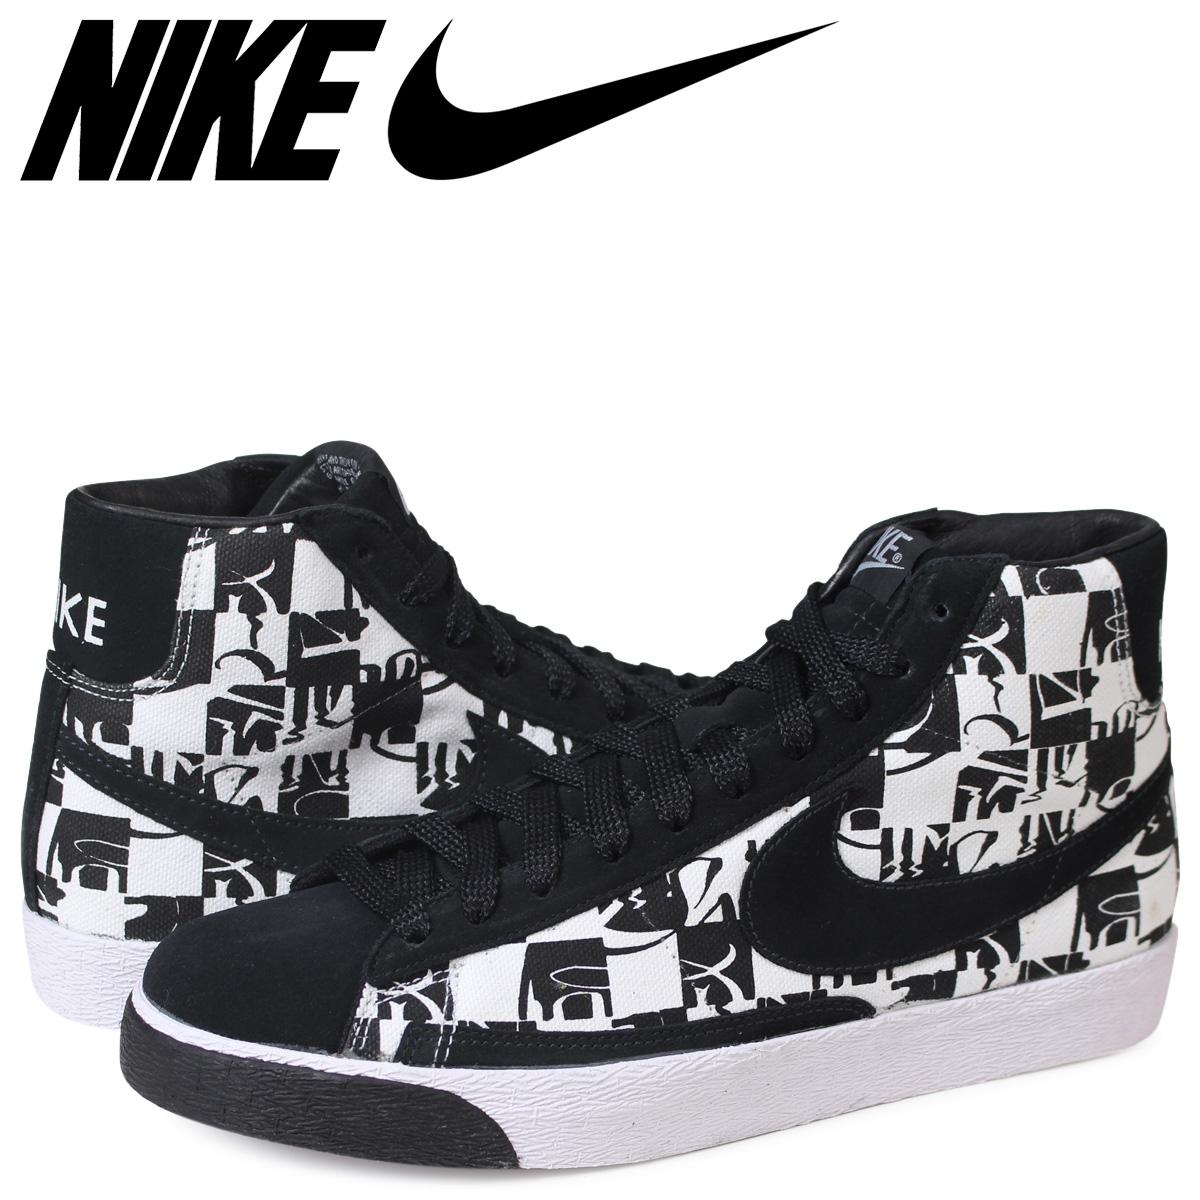 Tz High Online Blazer ShopNike Sugar Sneakers Premium bg7yfvY6